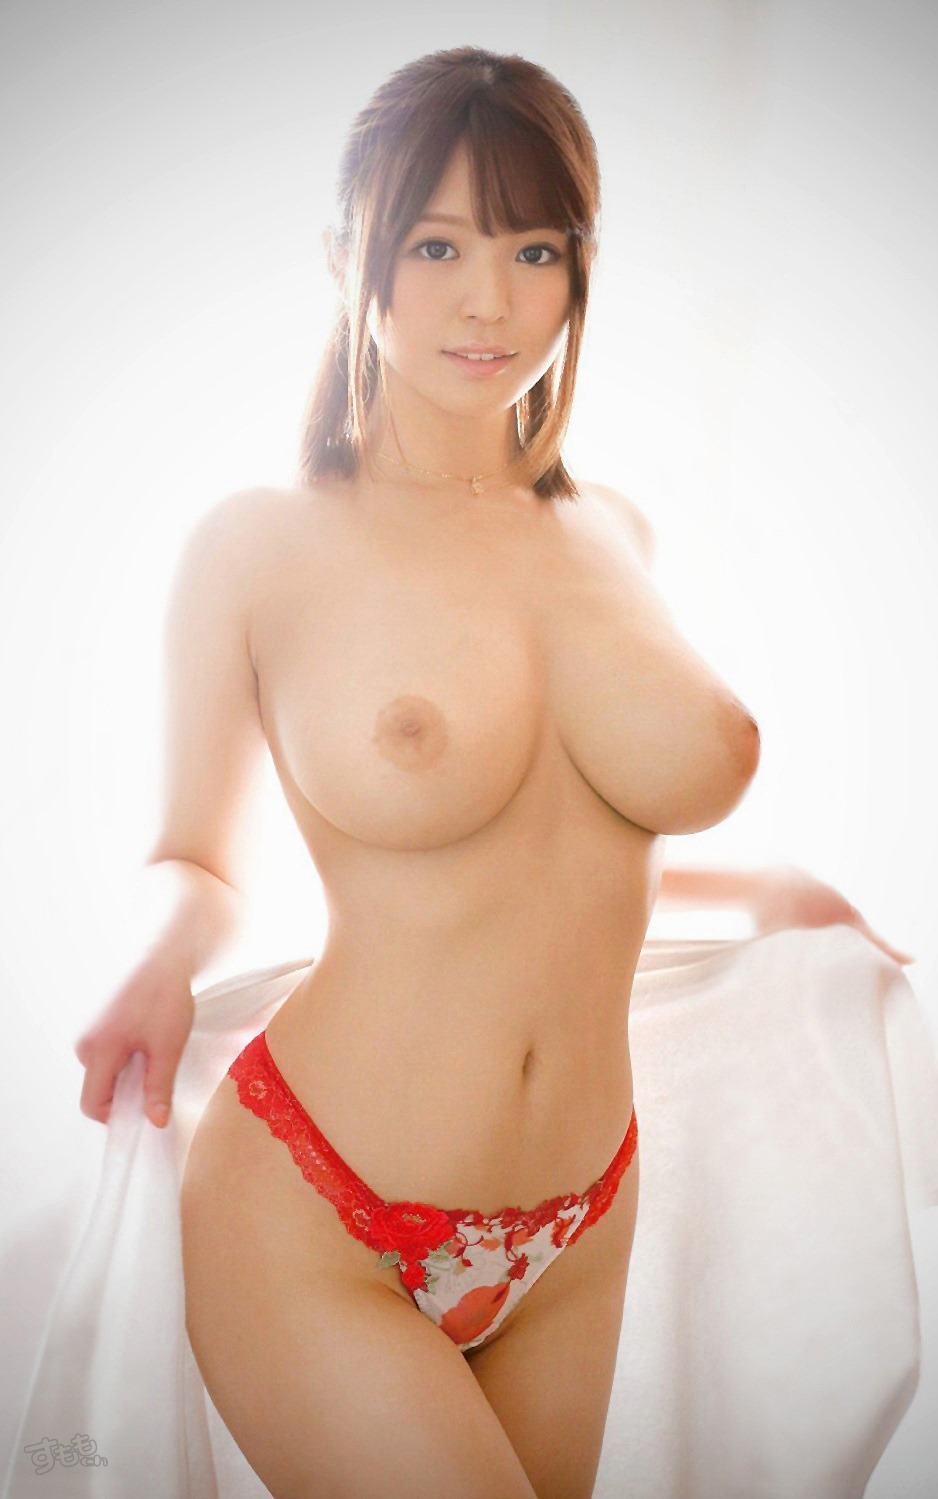 belly_6023-016